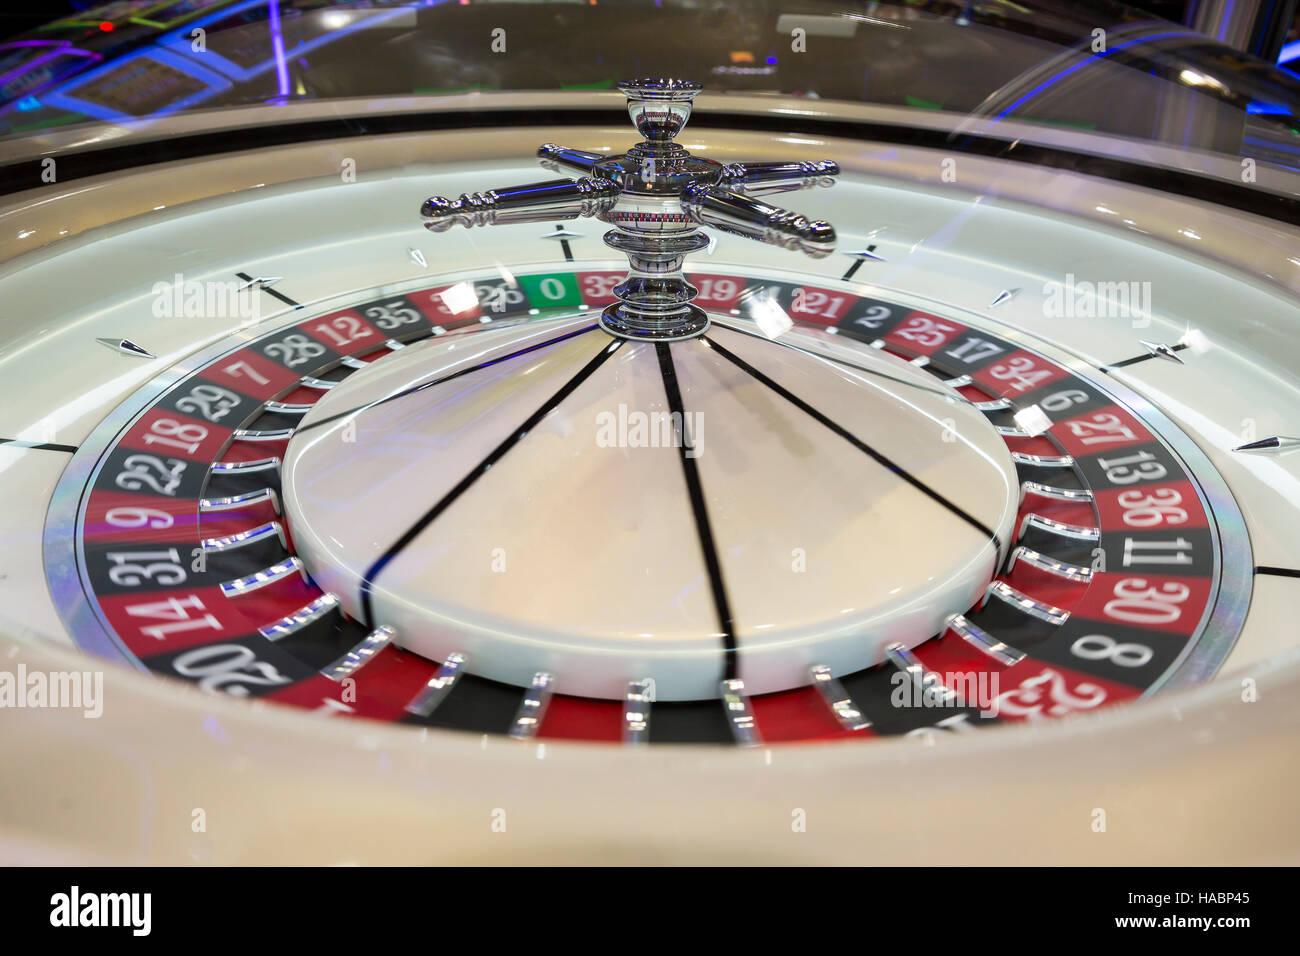 Wooden roulette buy black wooden roulette blackjack table led - White Casino Roulette Casino Machine And Gambling Equipment Stock Image